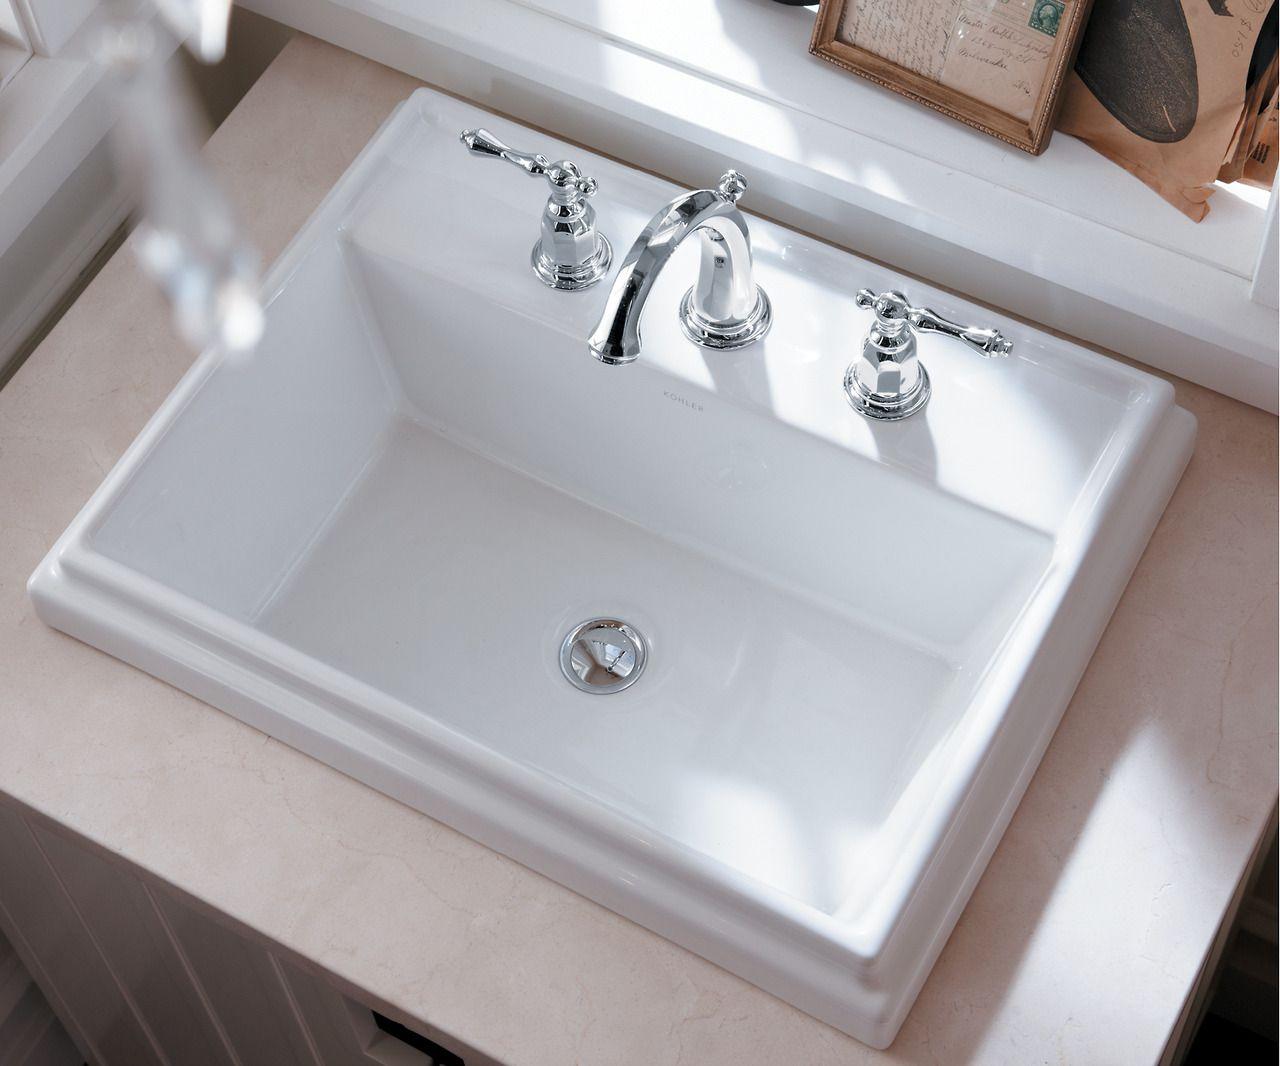 The Bold Look Of Drop In Bathroom Sinks Eclectic Bathroom